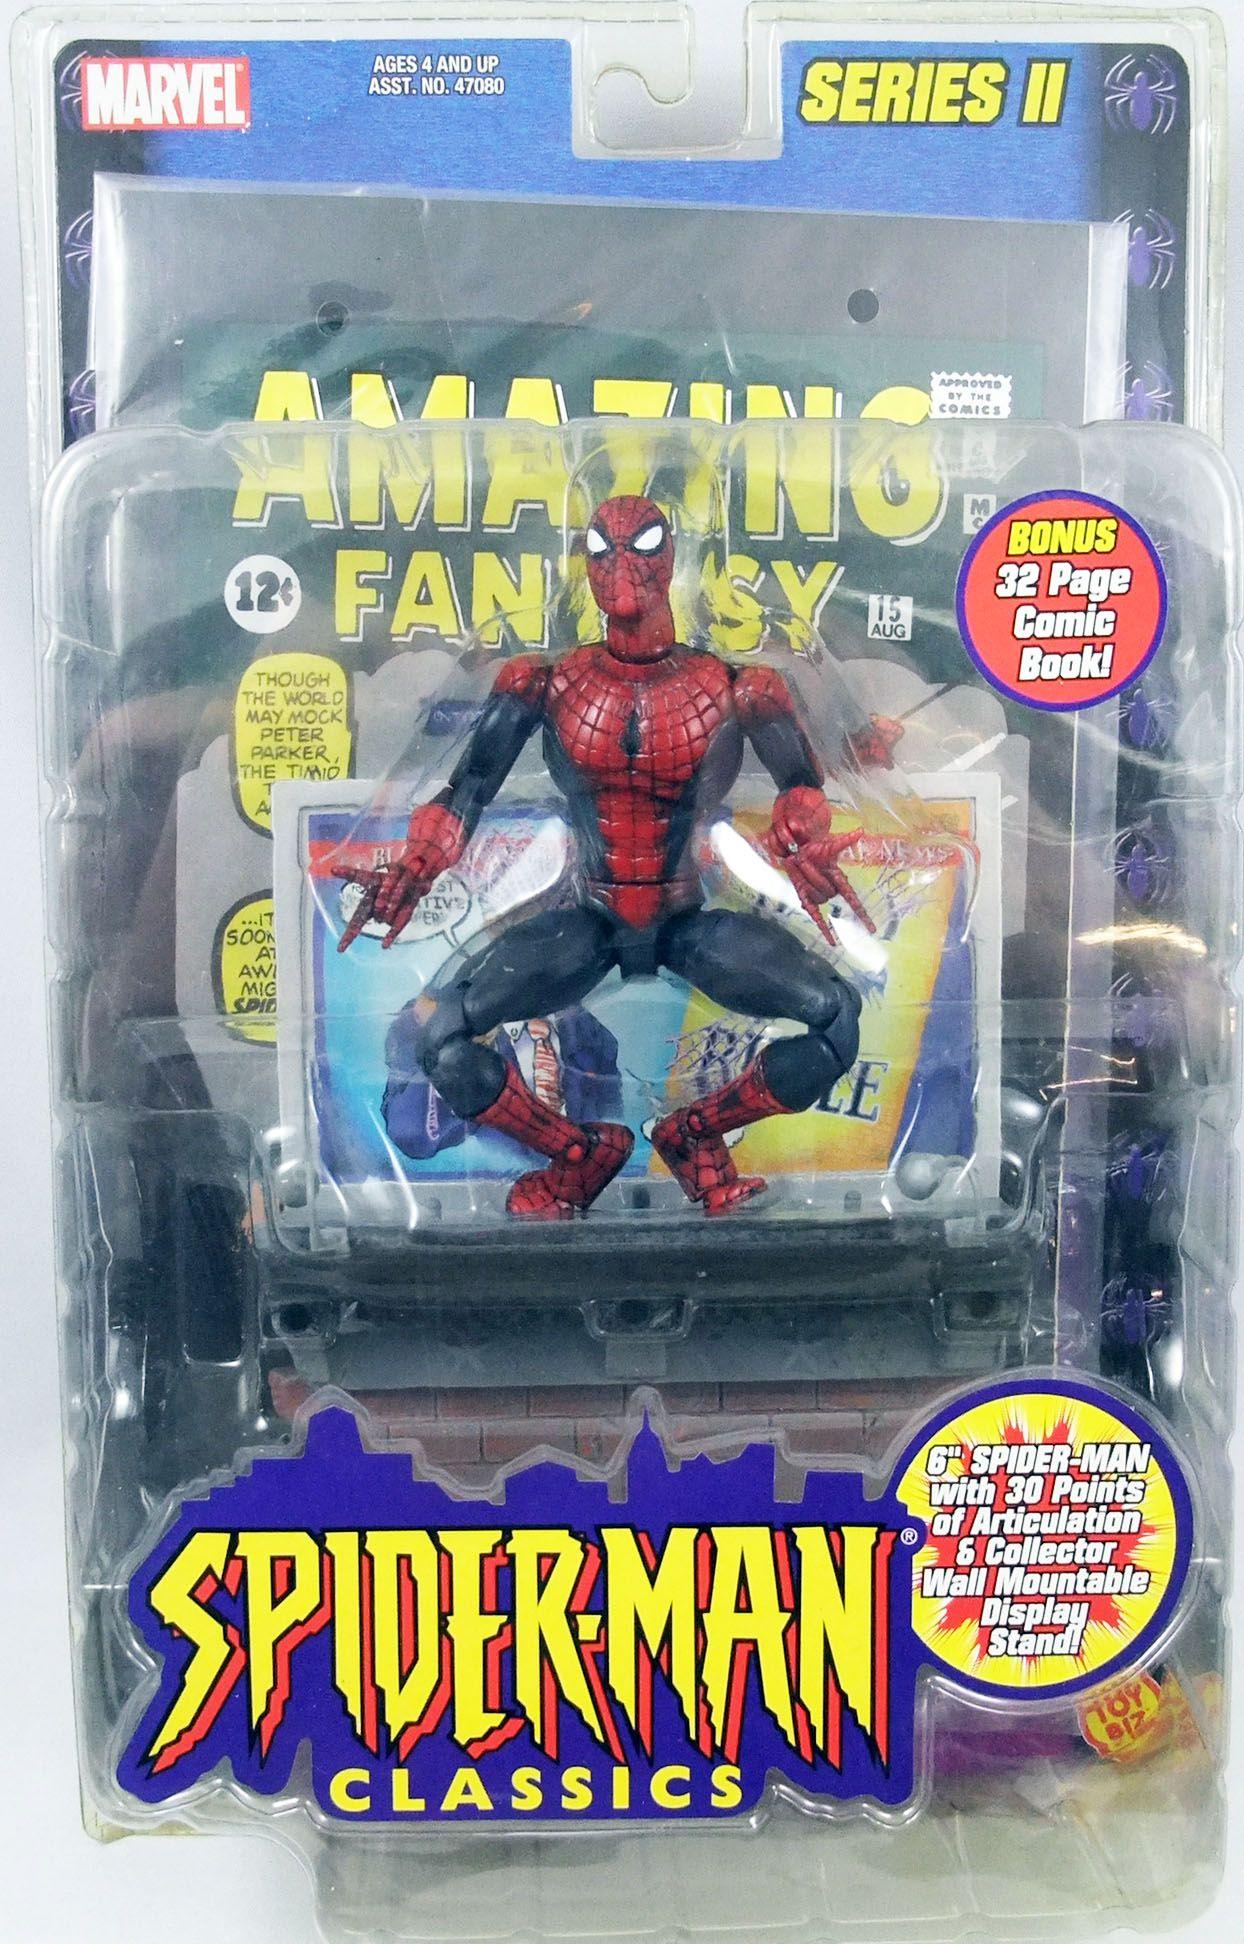 Spider-Man Classics - Spider-Man II